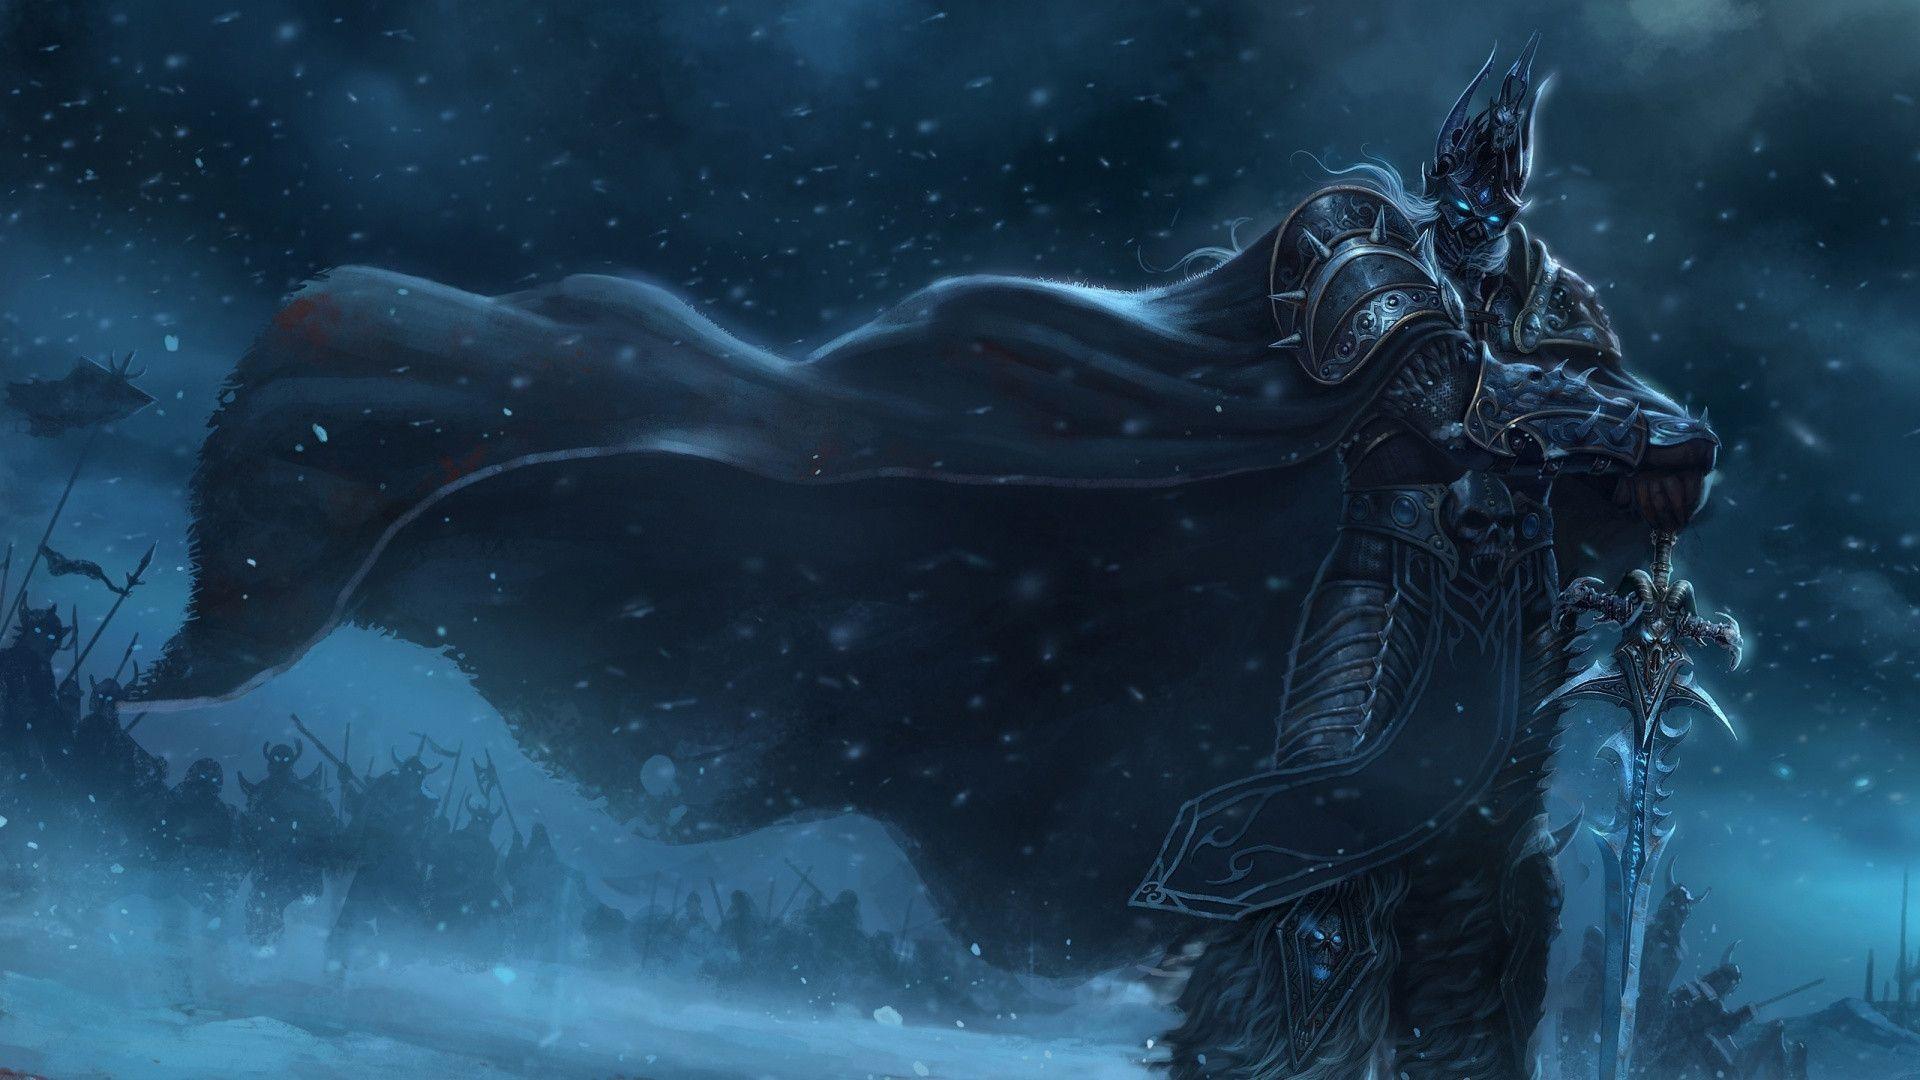 Destiny-Taken-King-Warlock-wallpaper-wp2004418